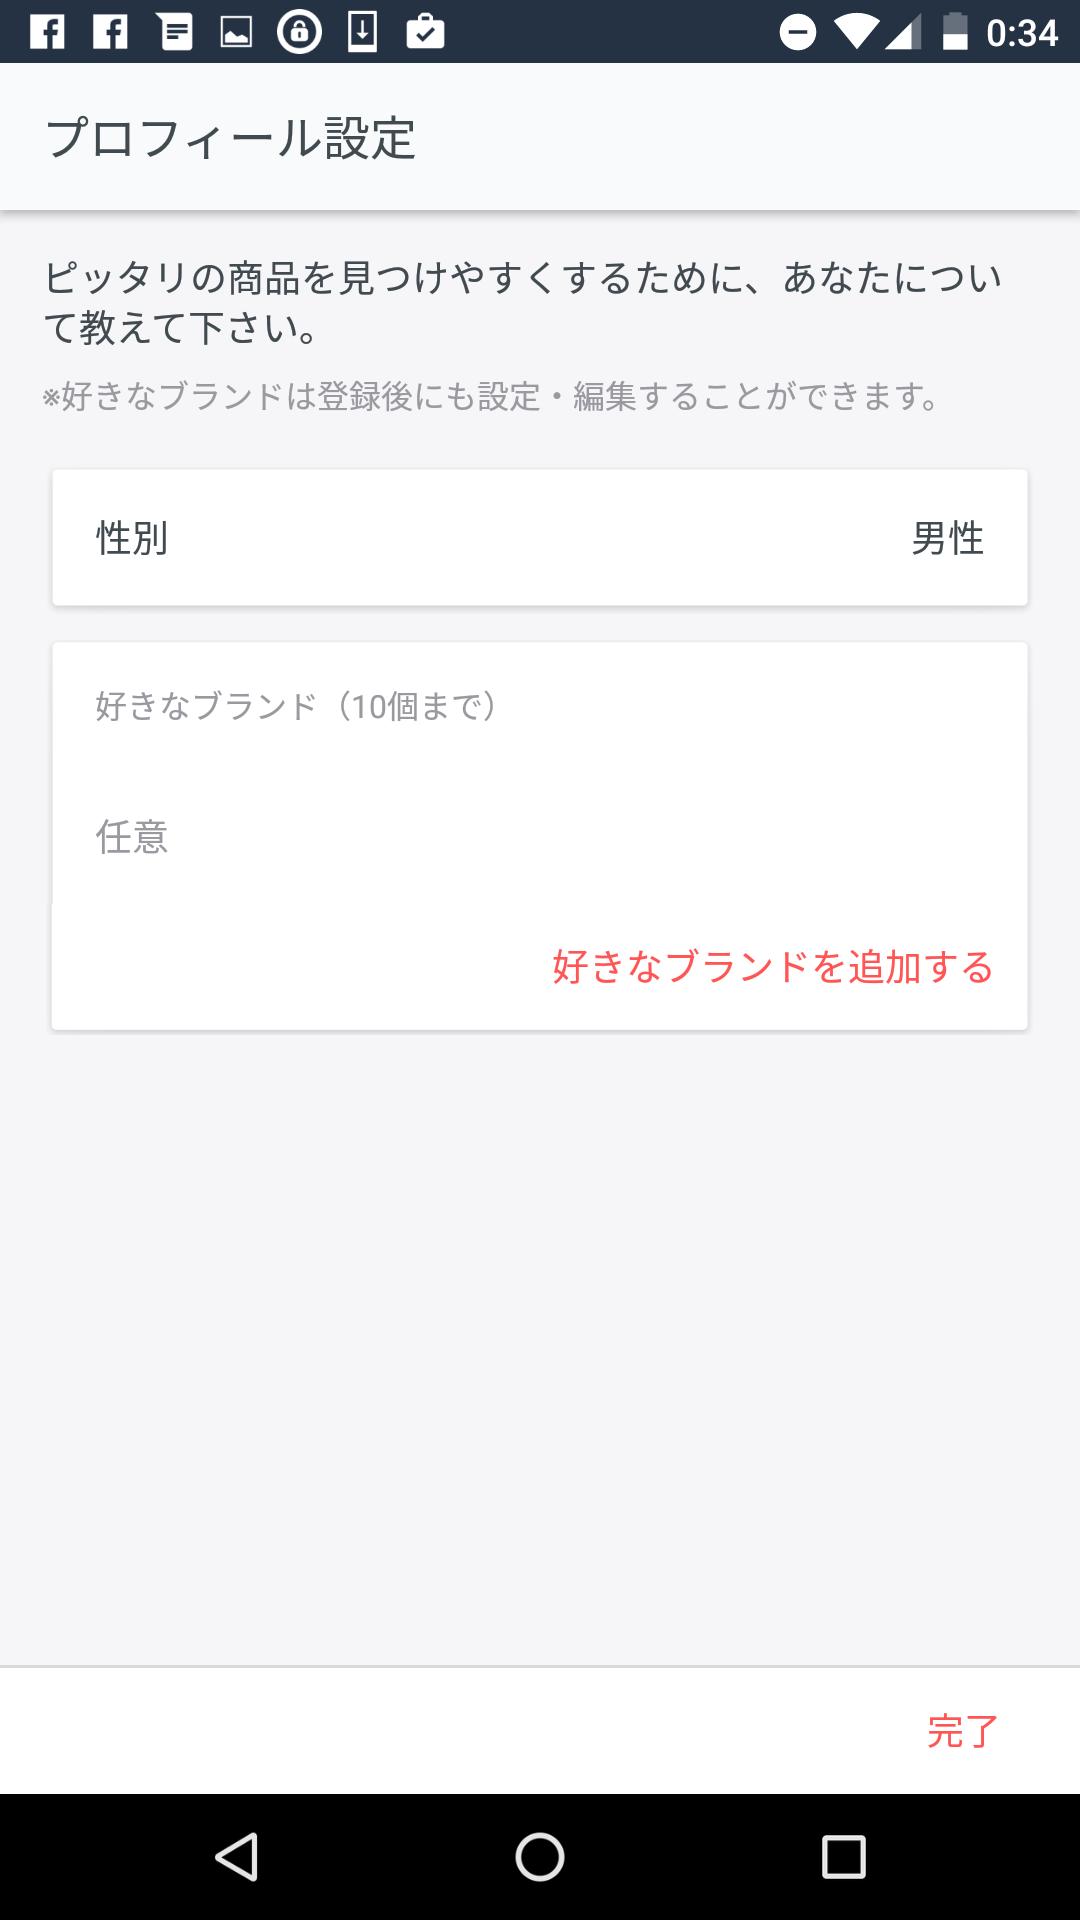 Screenshot_20160916-003440.png